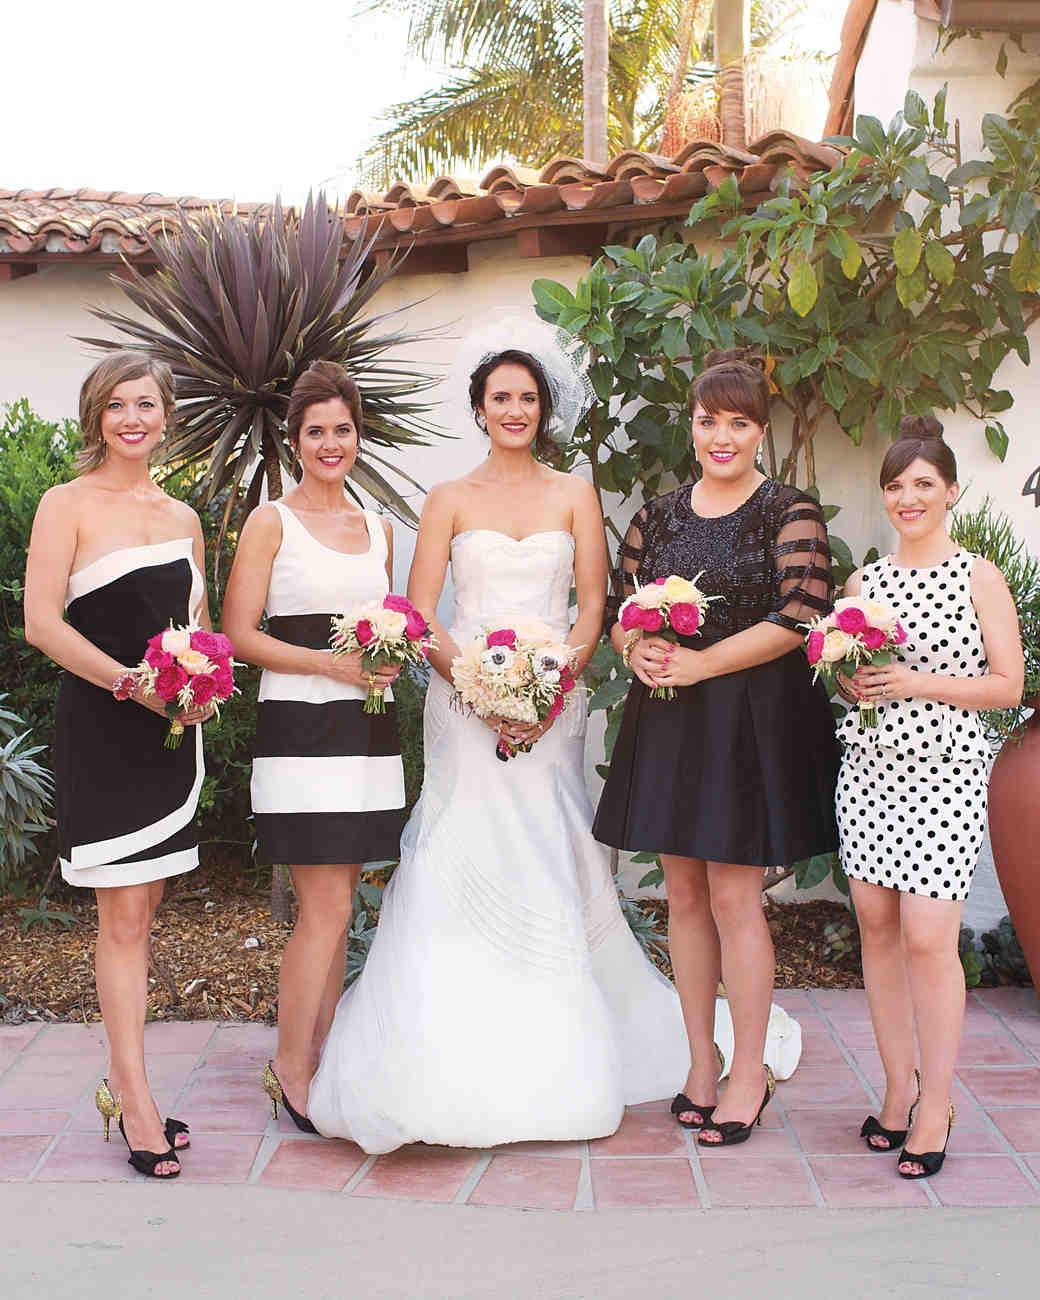 Bridesmaid dress color schemes